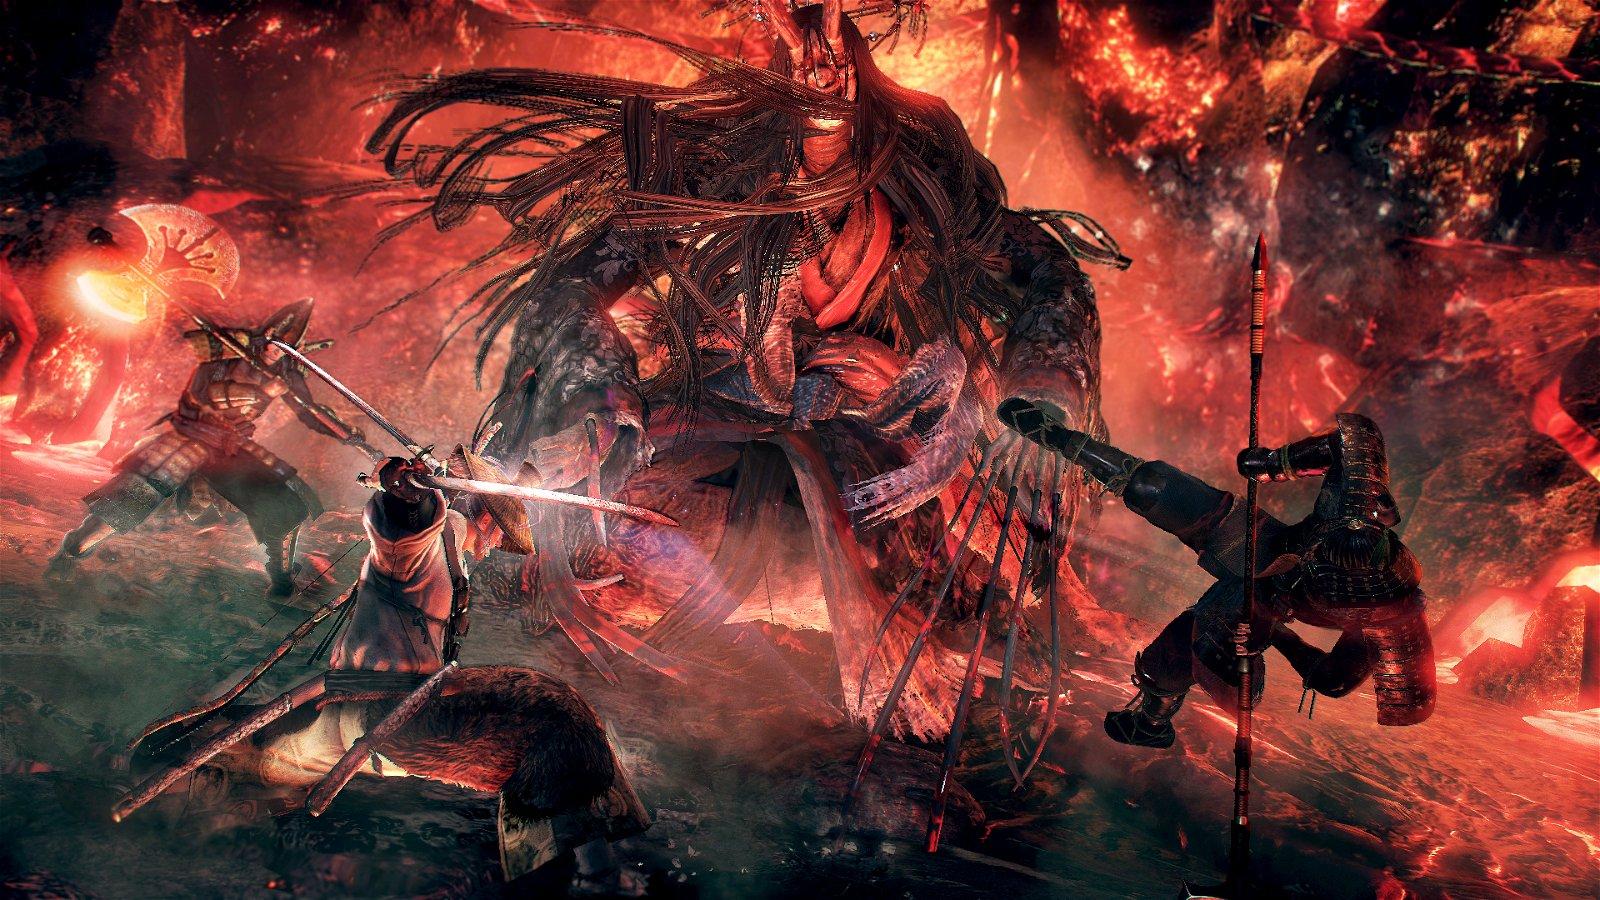 Nioh: Complete Edition (Pc) Review - Samurai Souls Comes To Pc 4